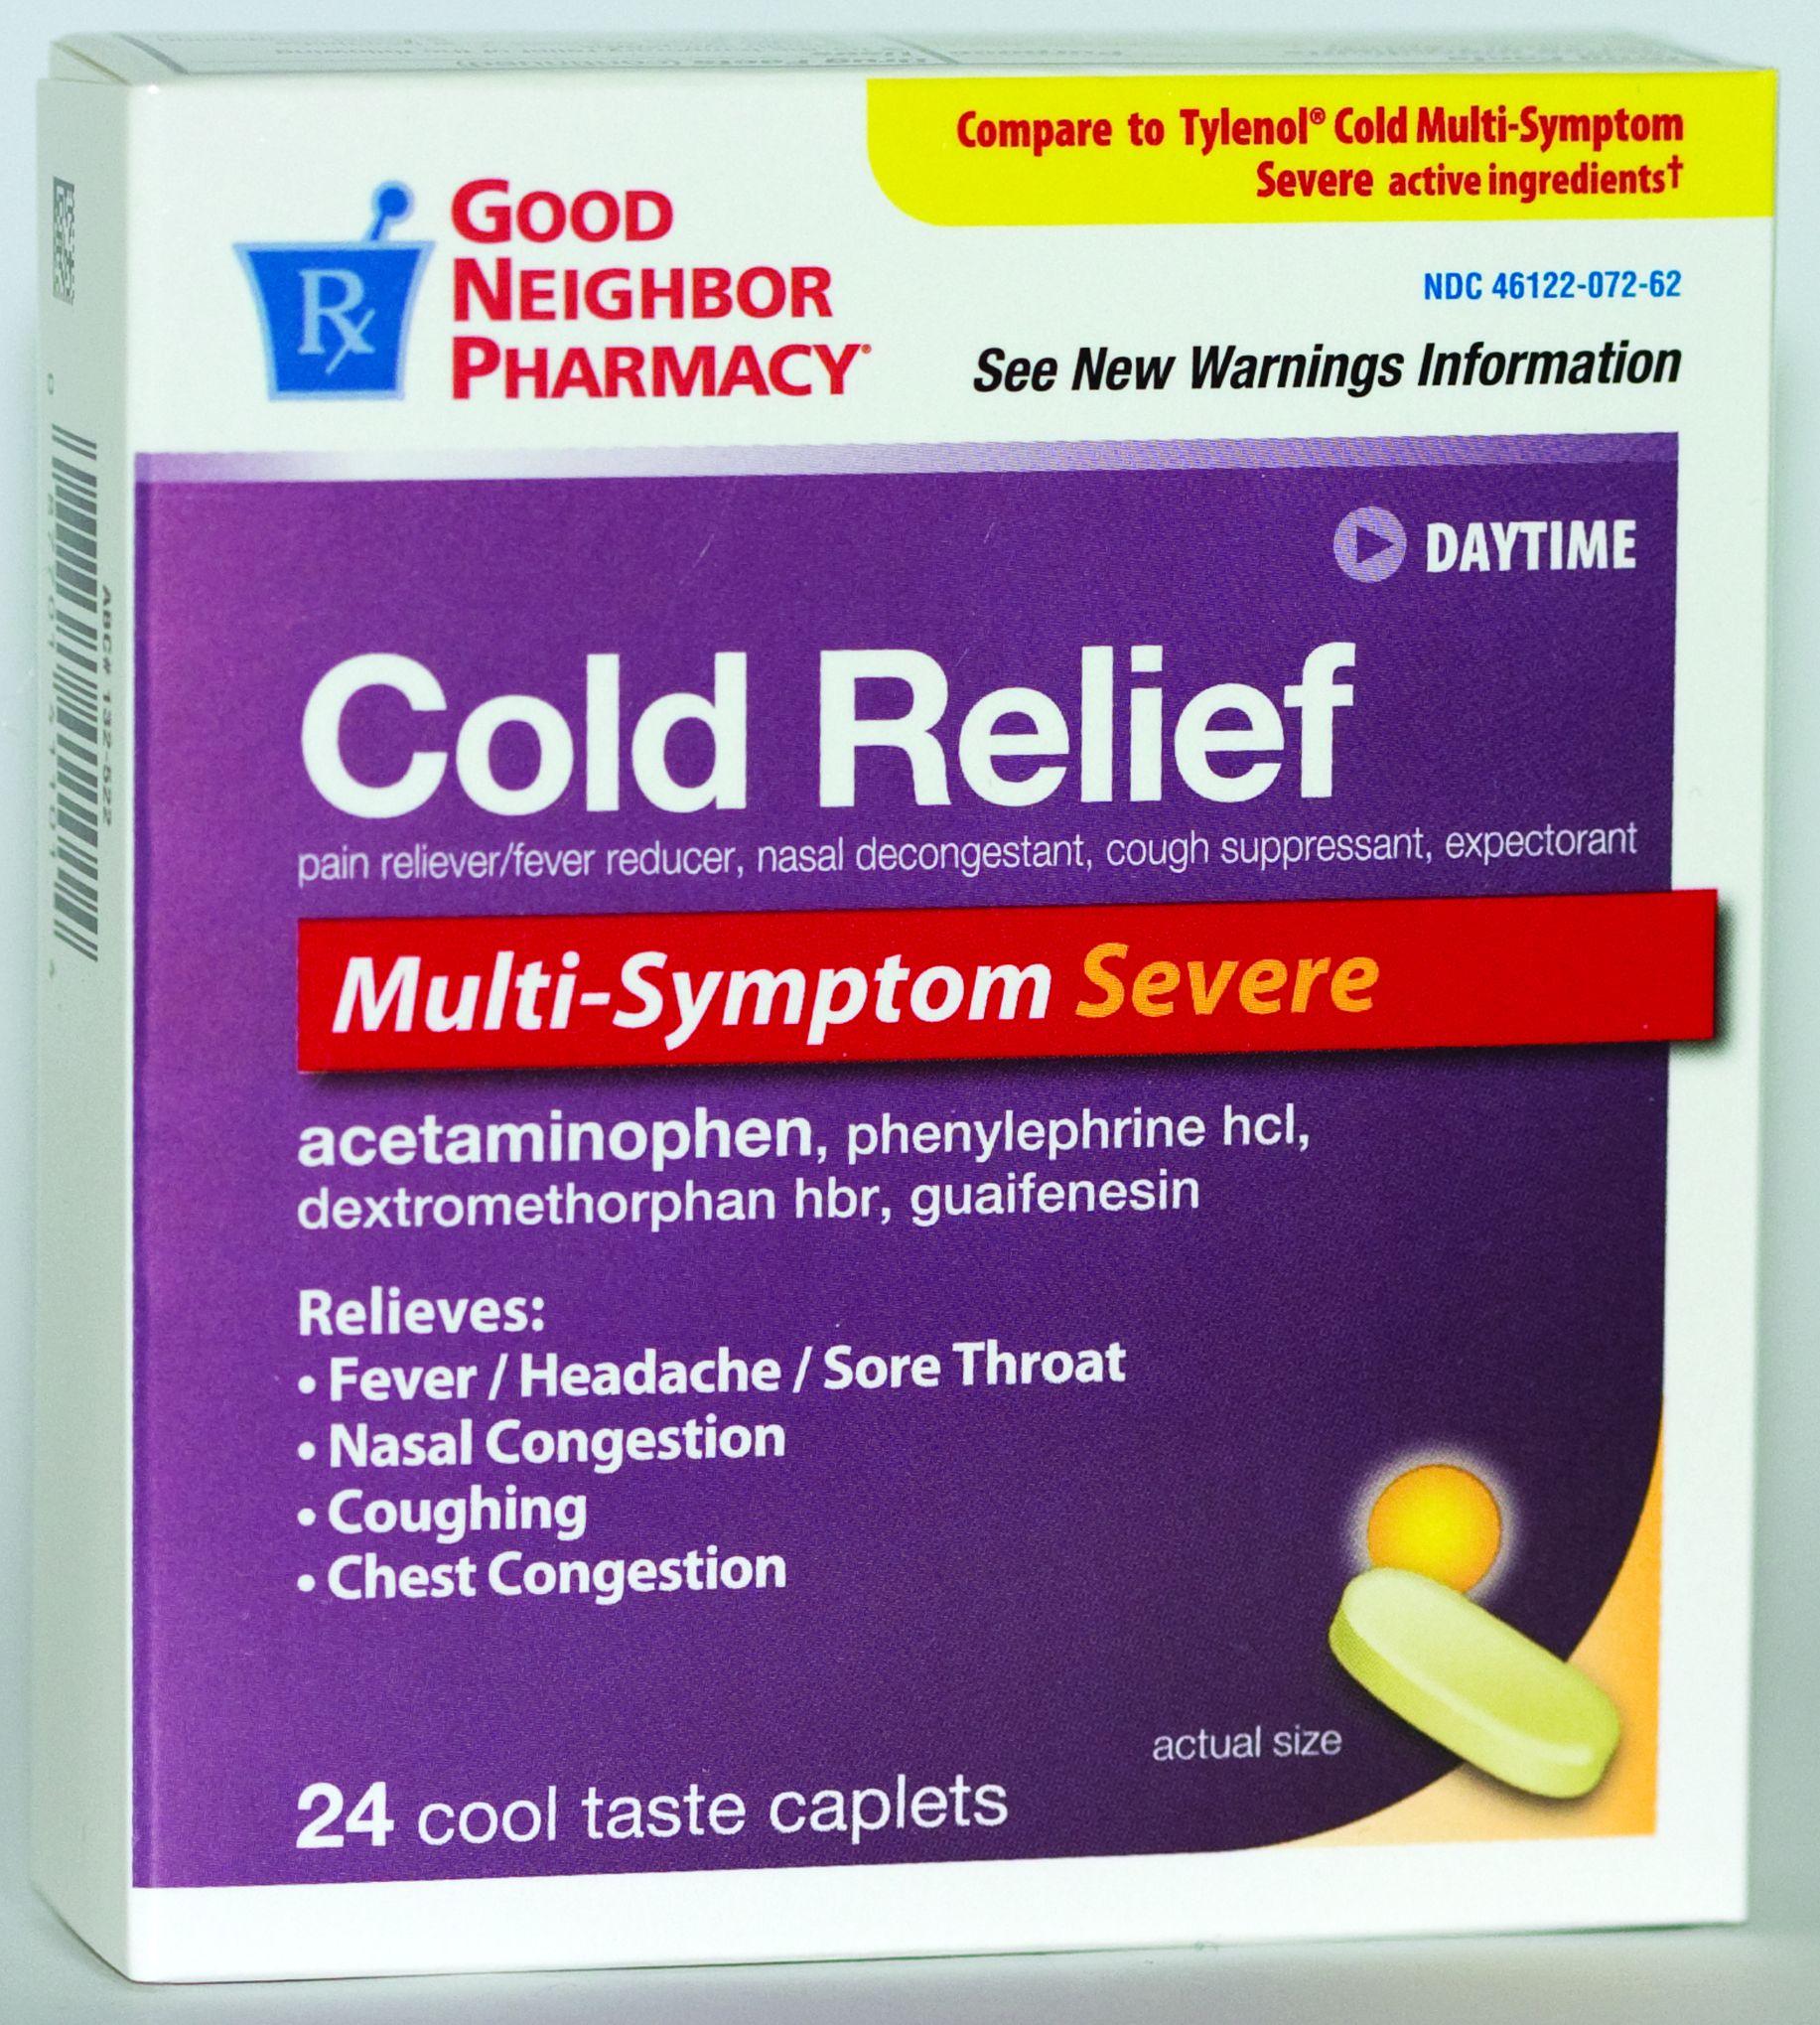 relief cough cold инструкция